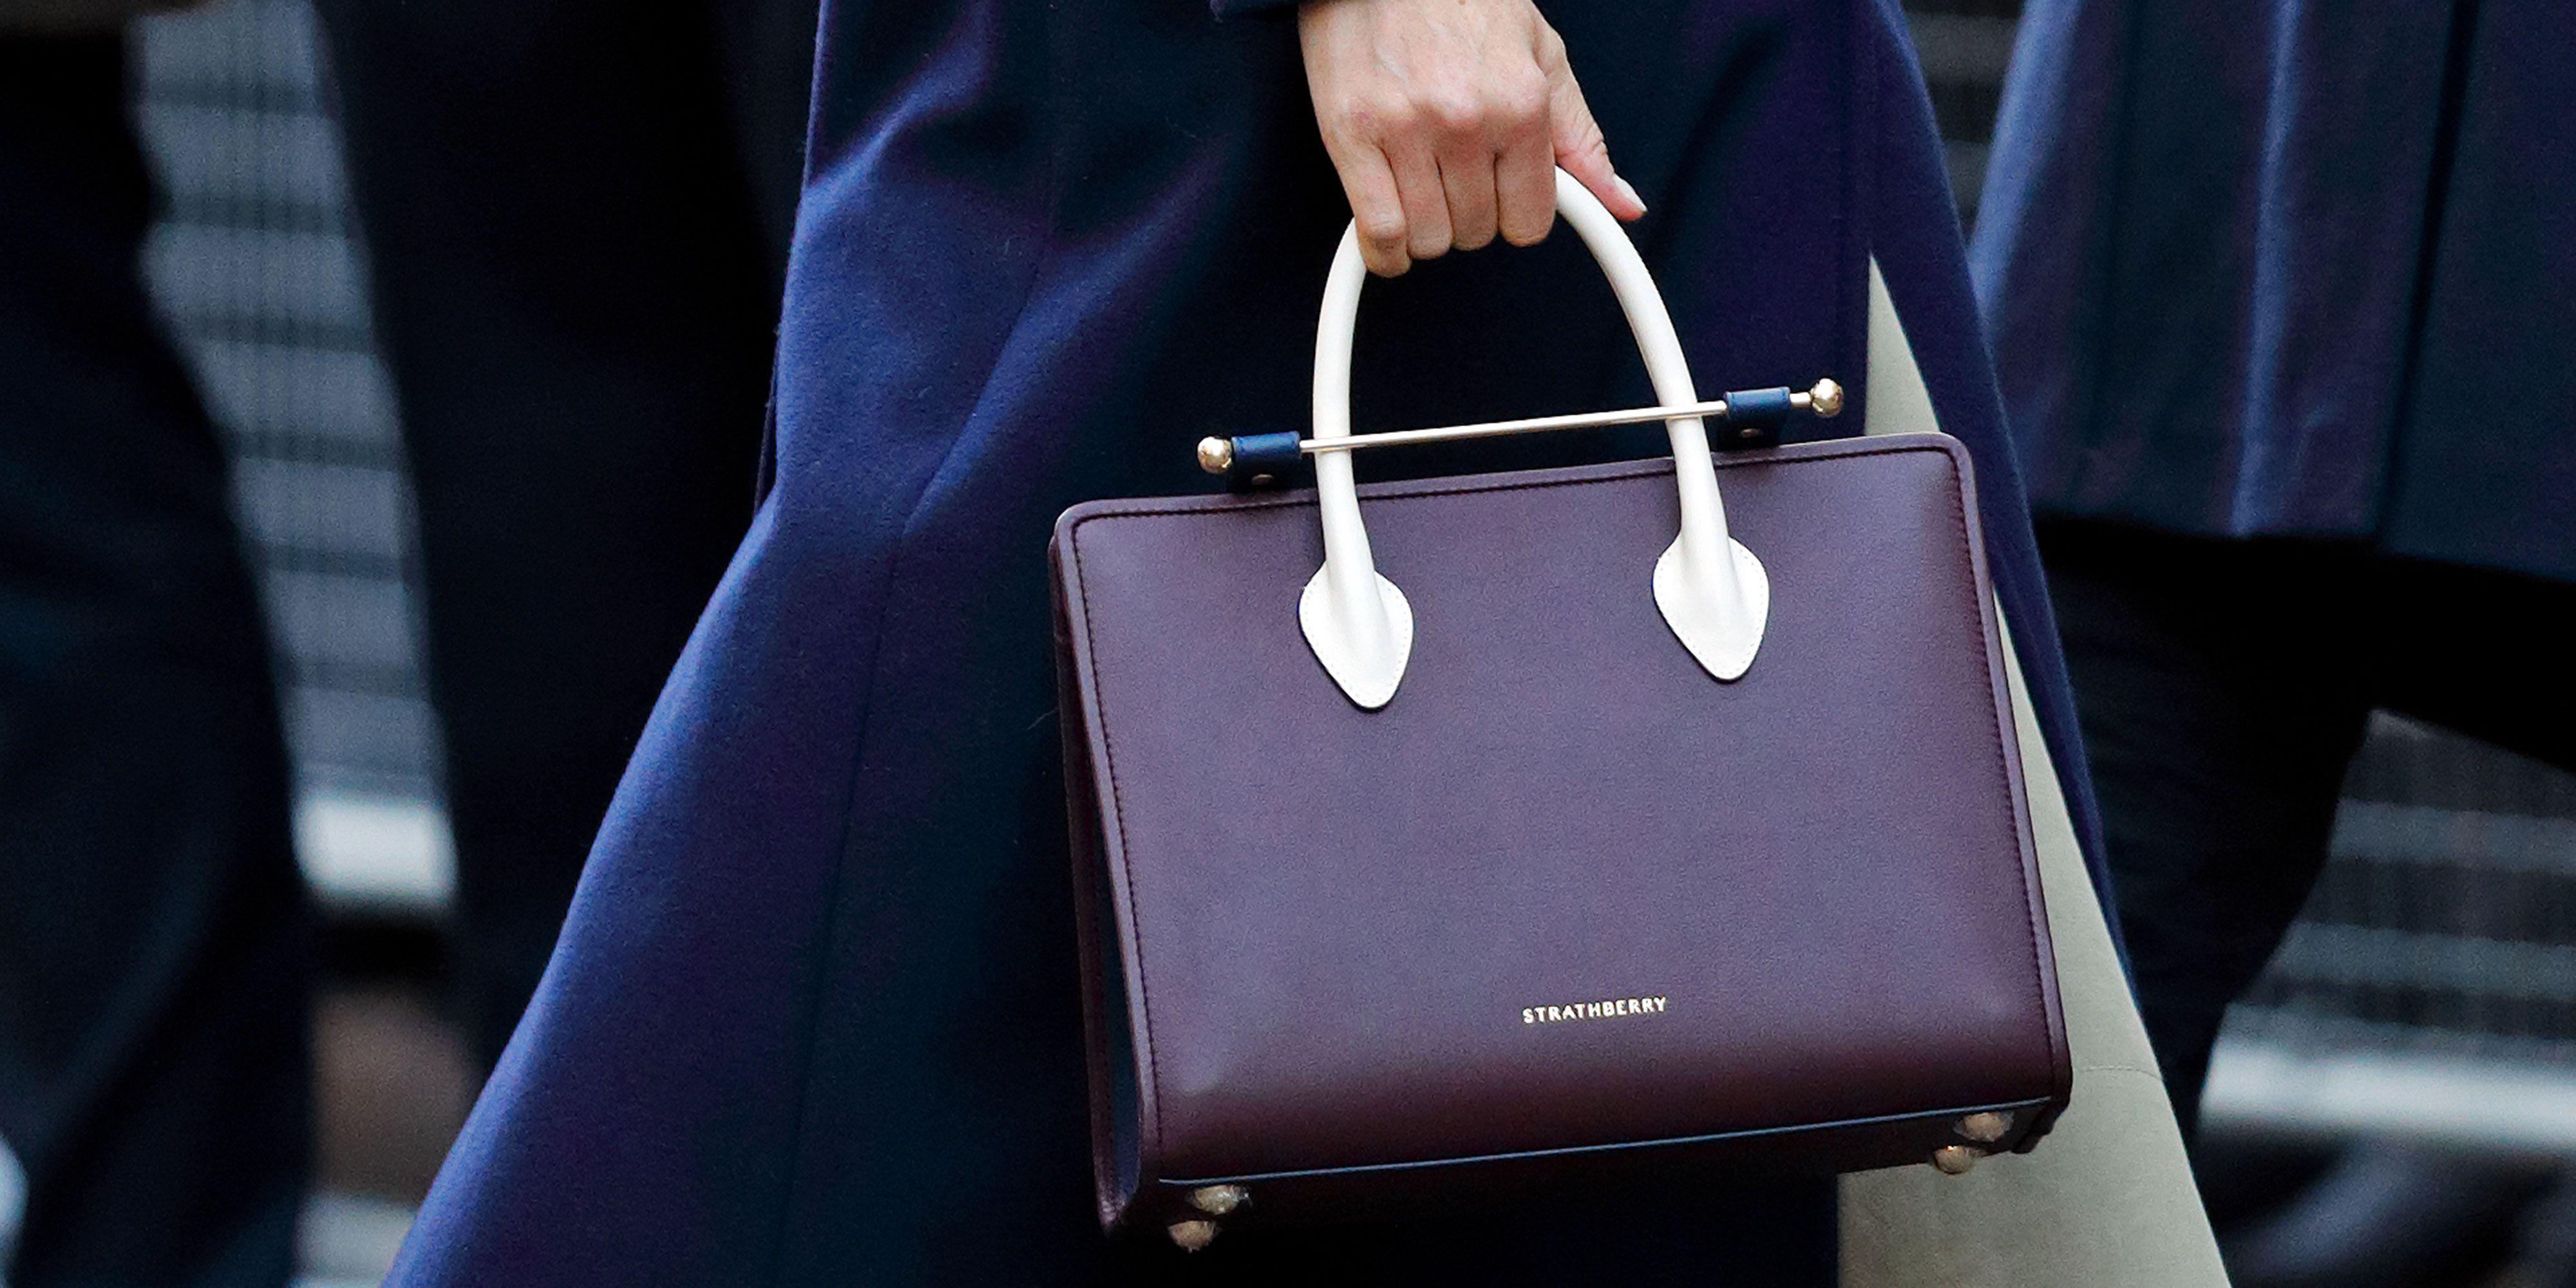 Strathberry bag